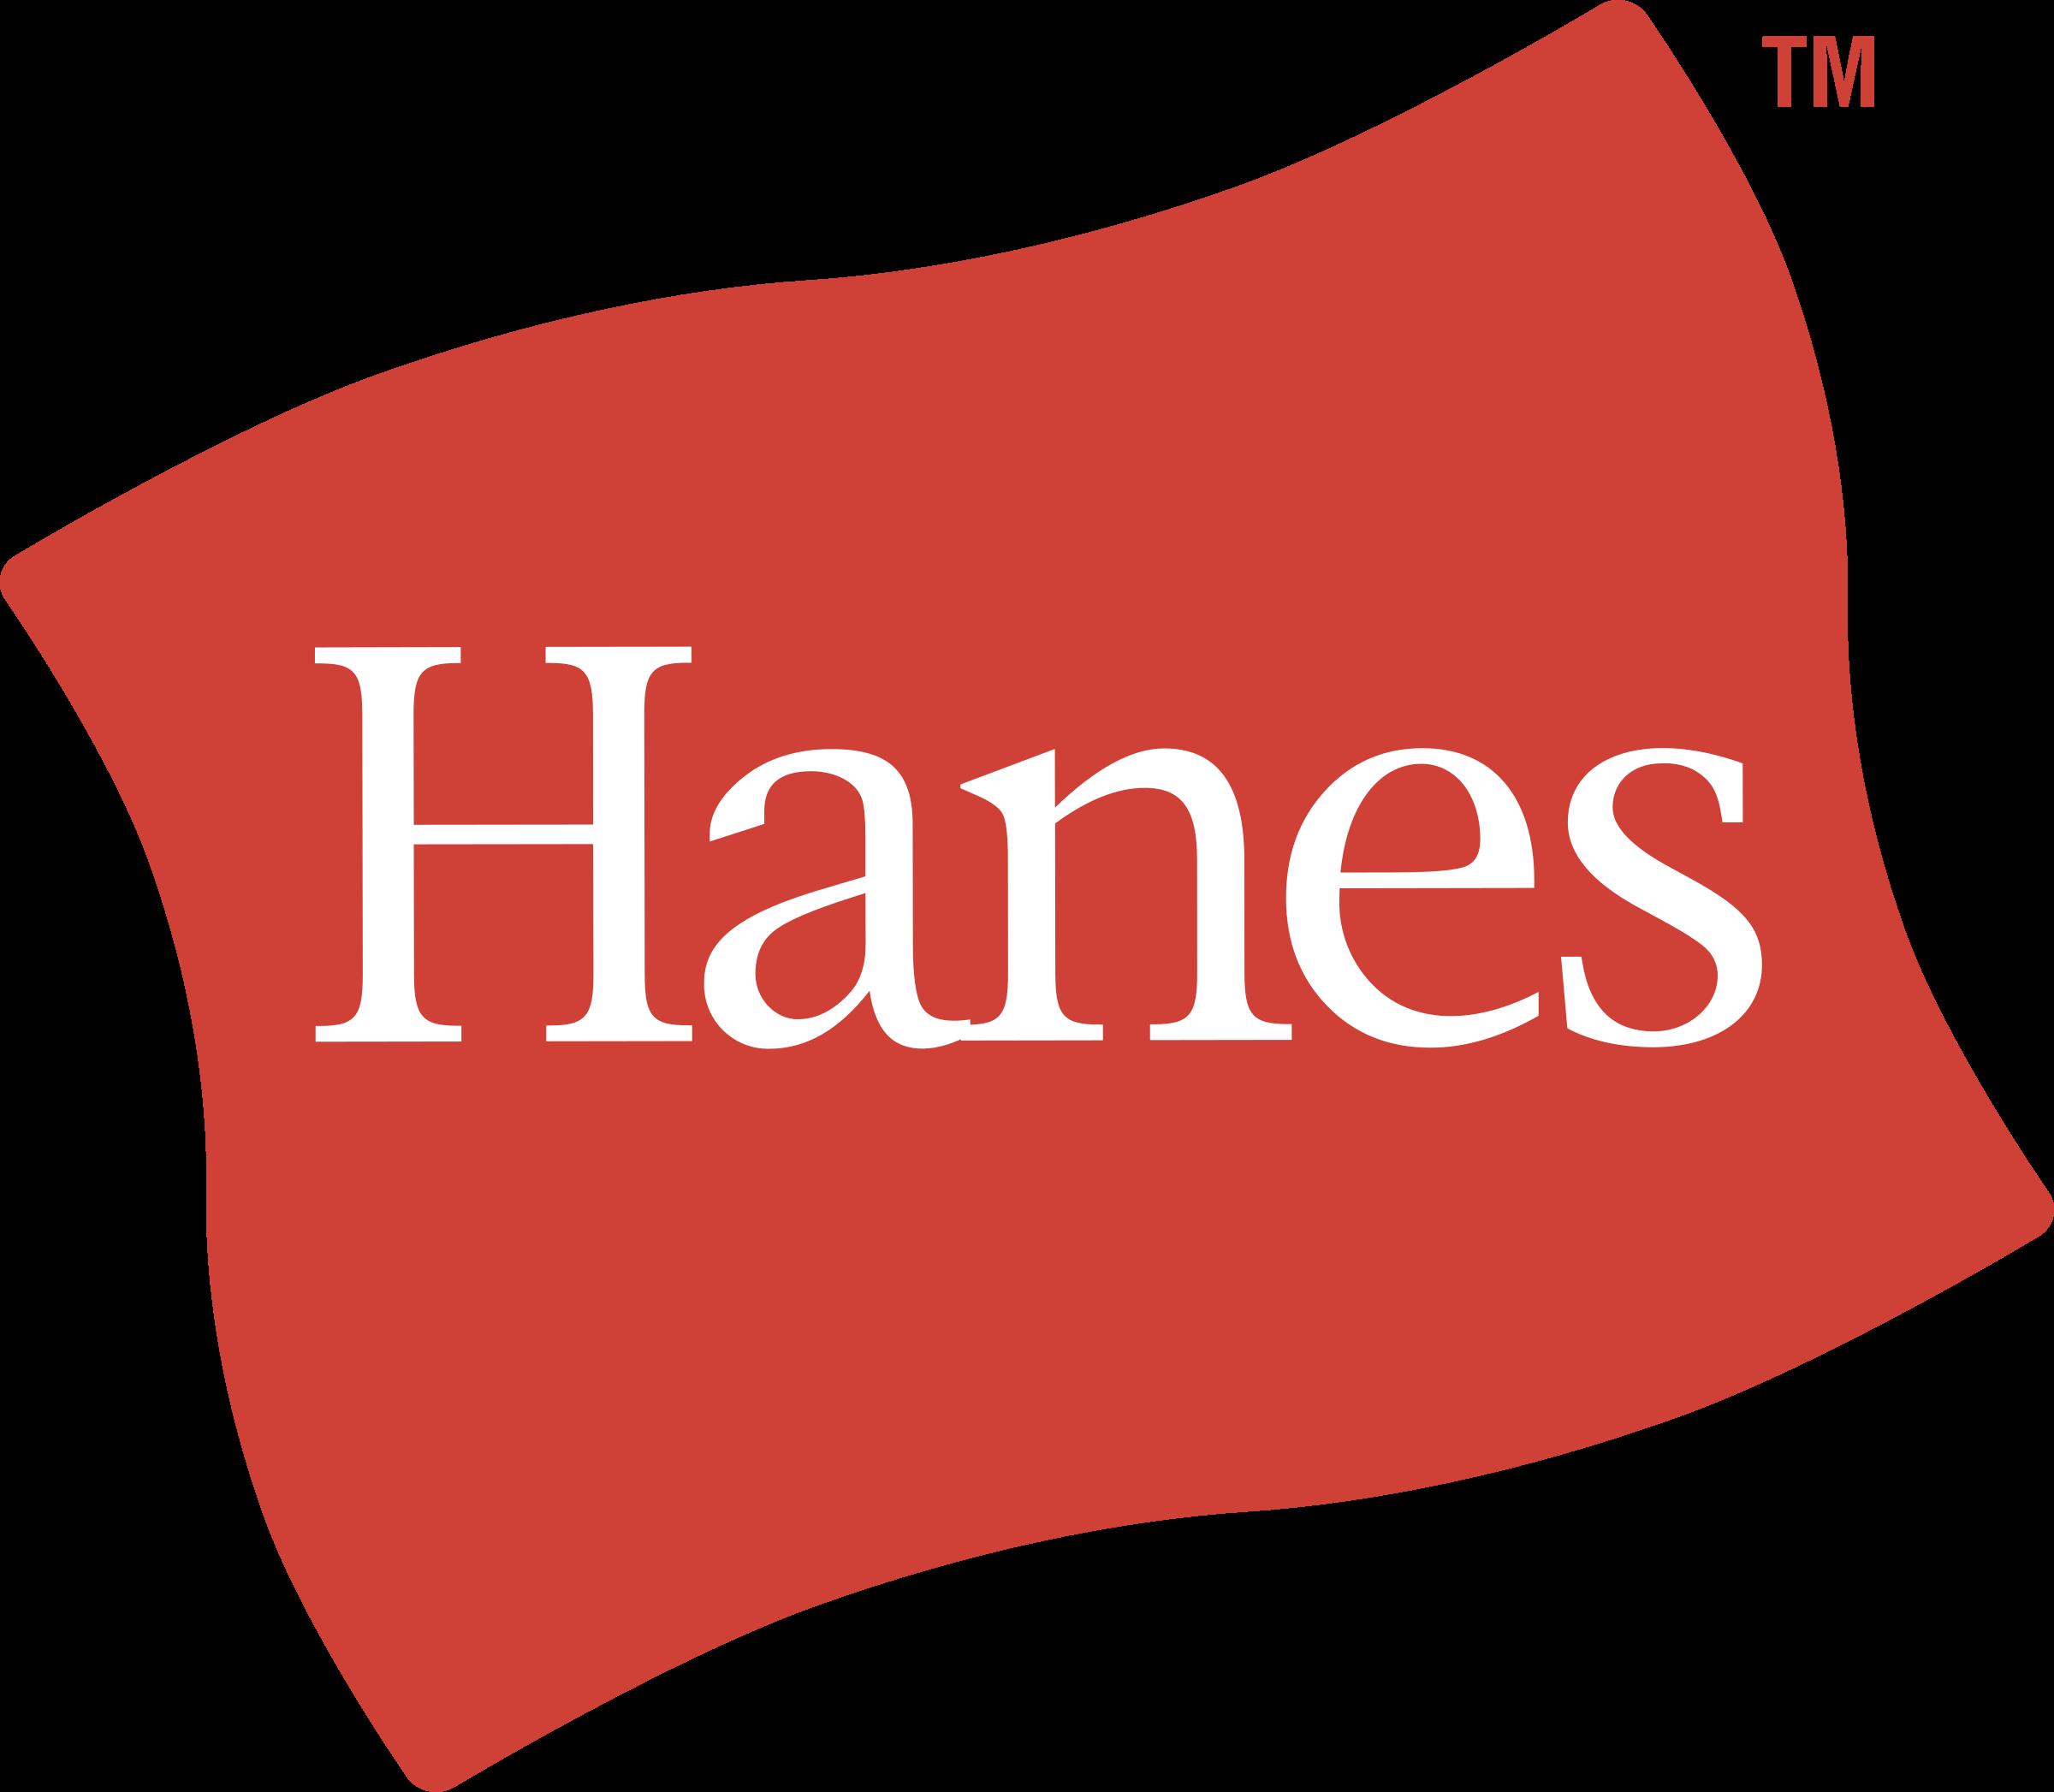 Hanes Brand 1 Logo Png Transparent Svg Vector Freebie Supply